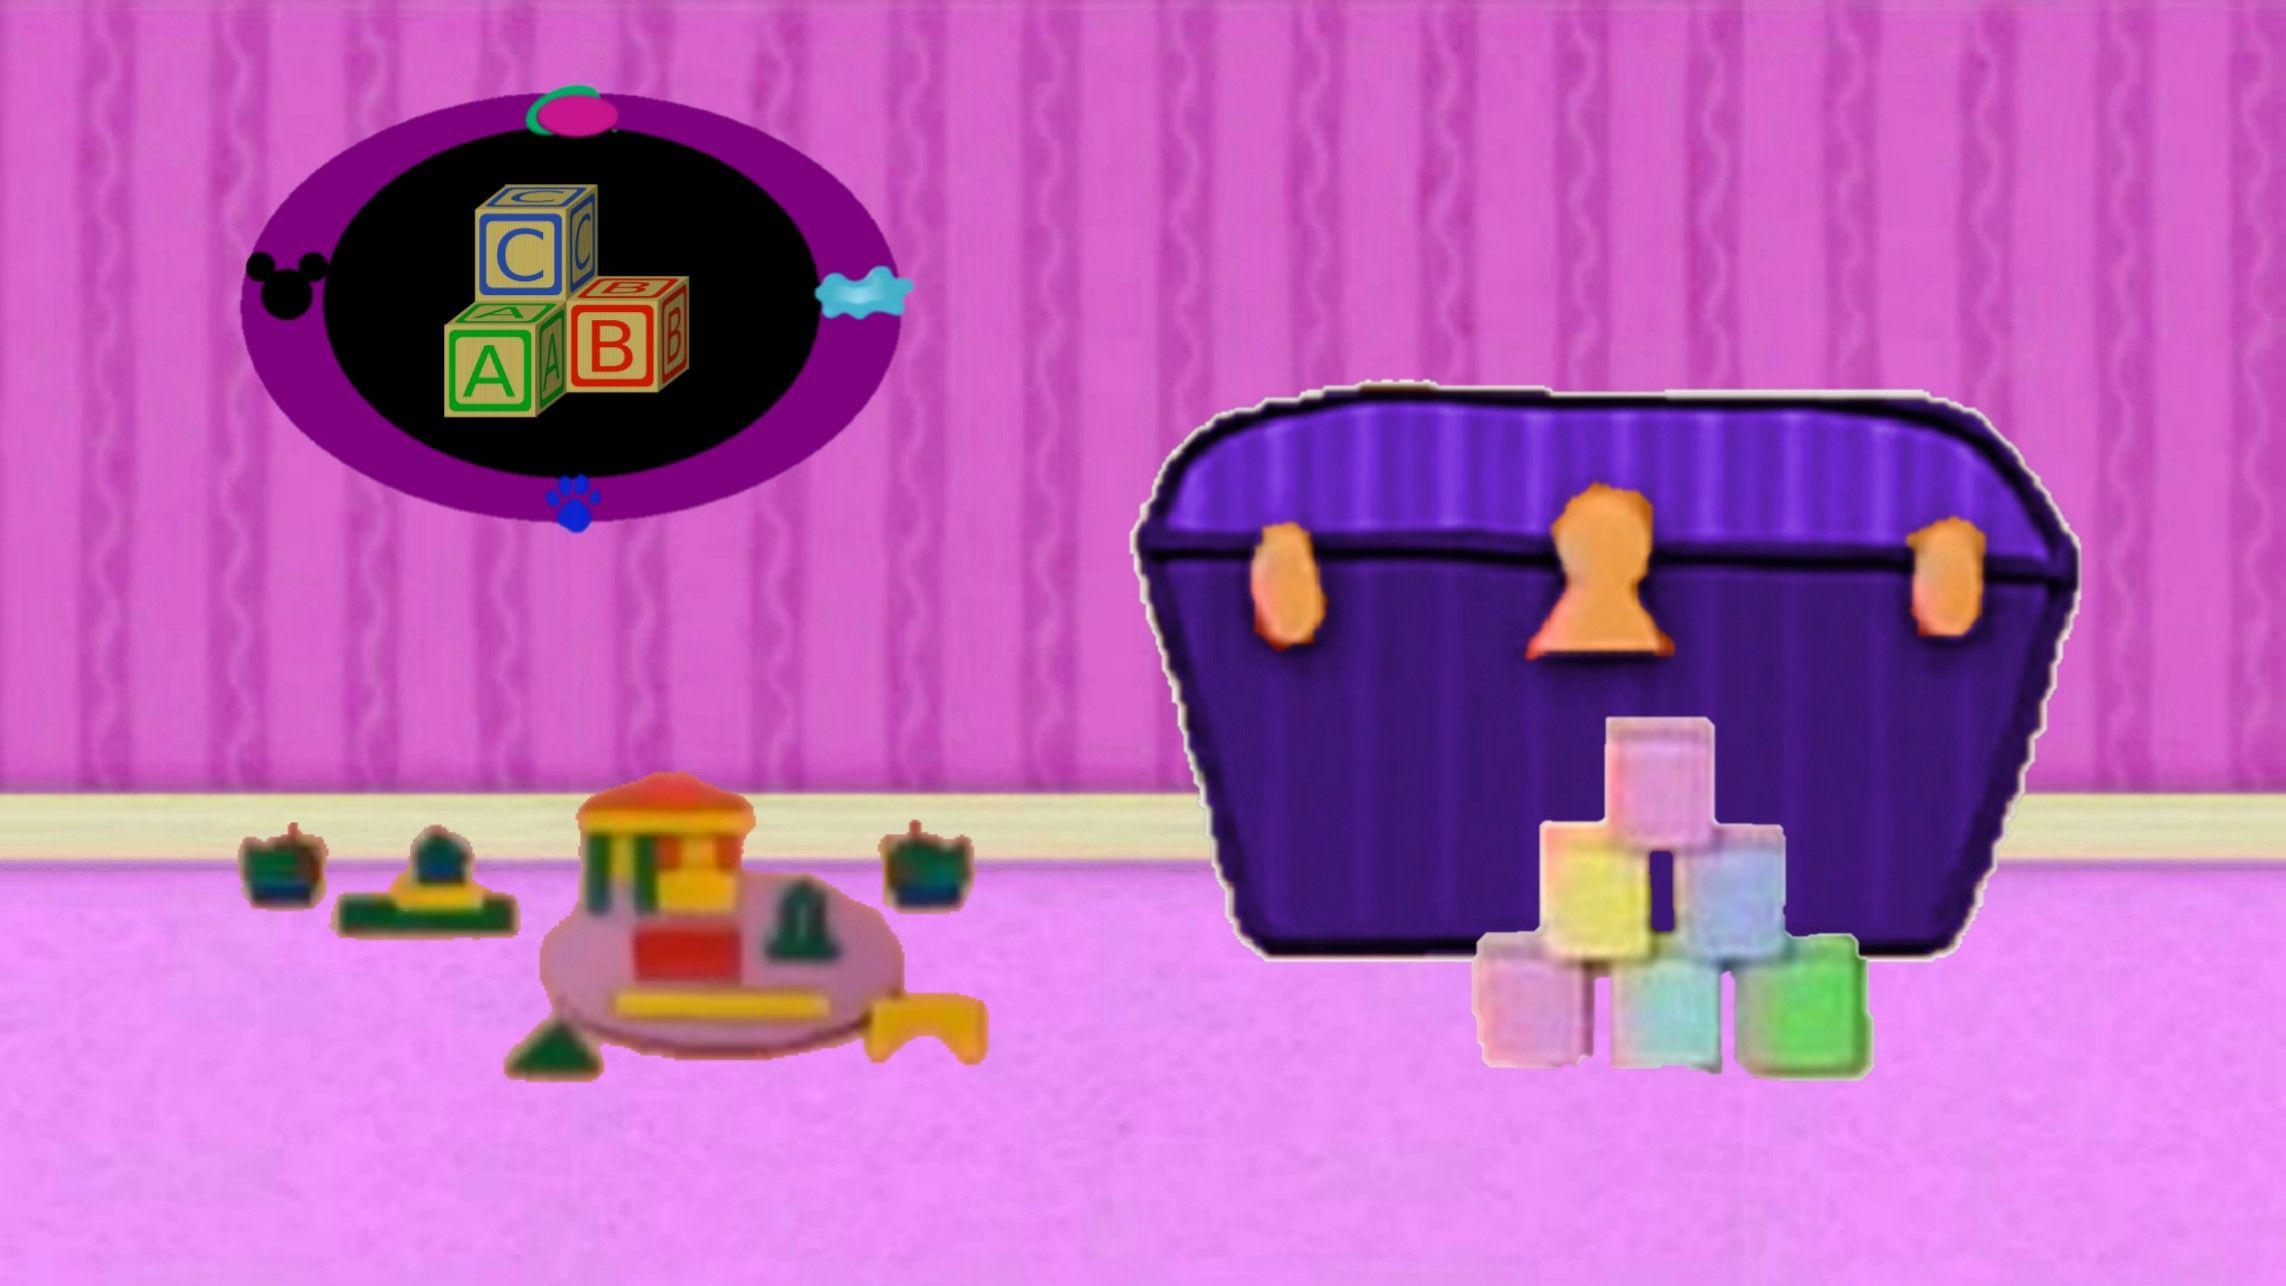 Playroom with Blocks Playroom, Games, Dinos